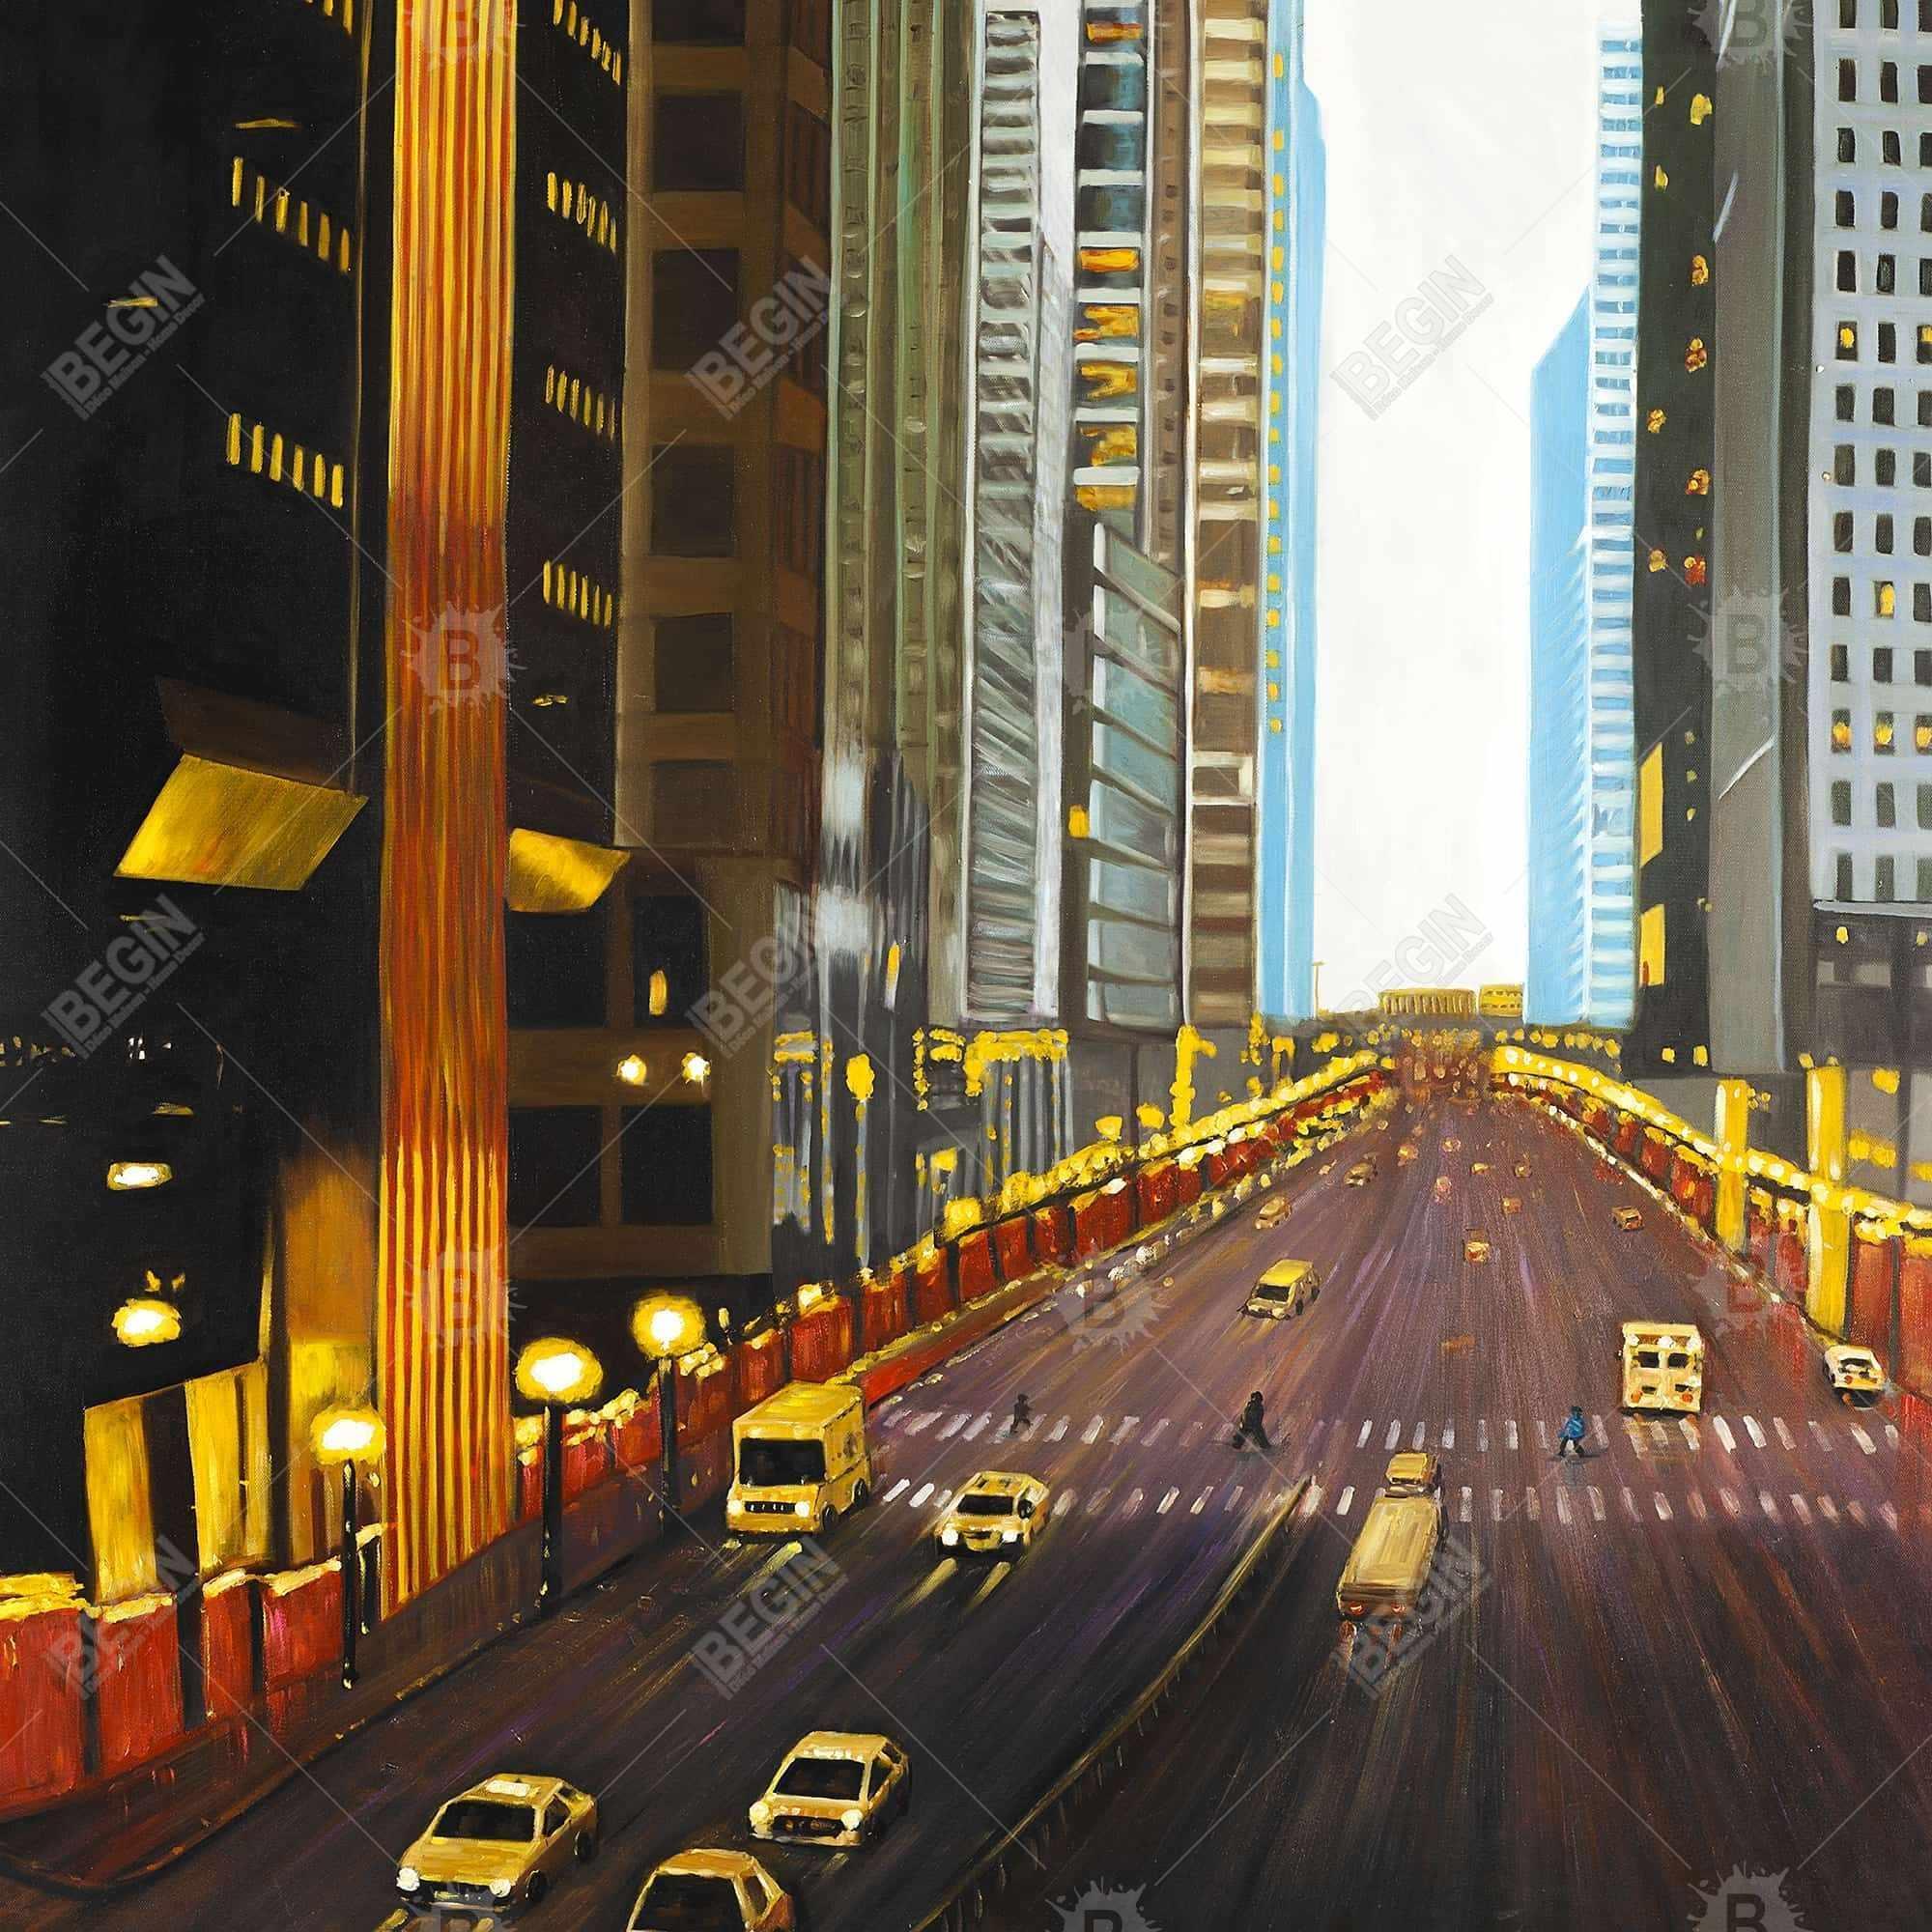 New york city 9th street